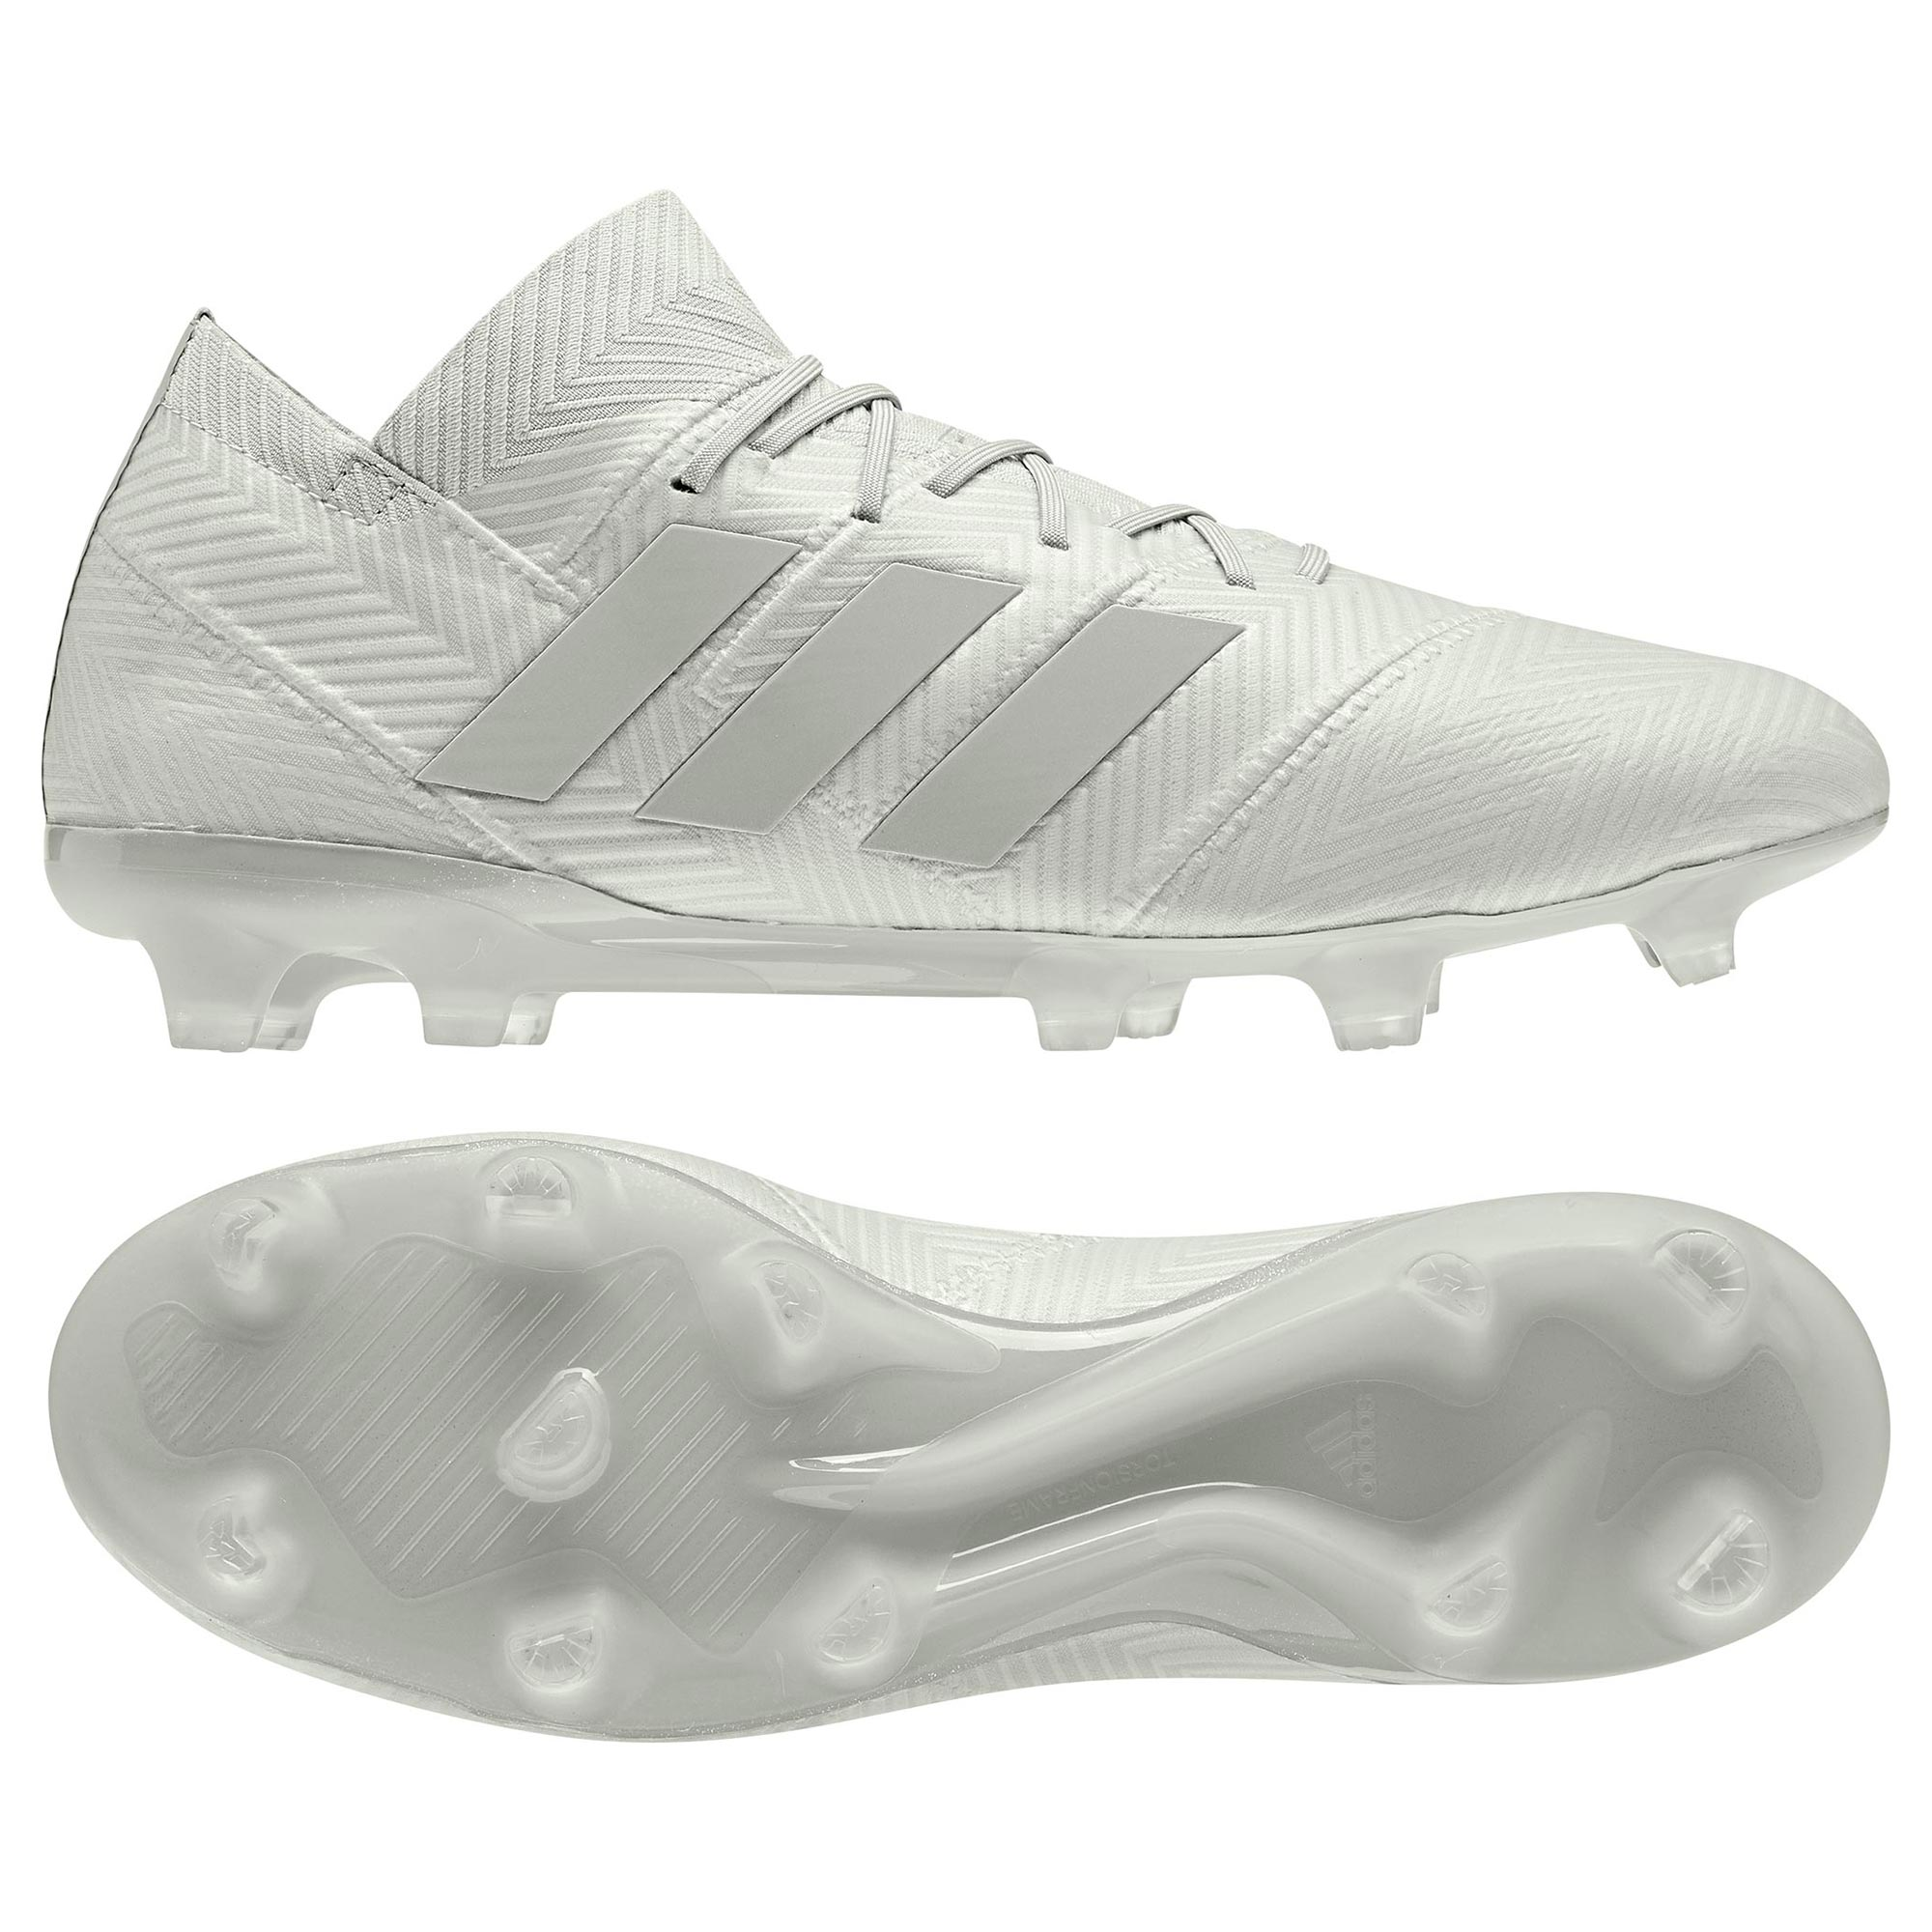 adidas Nemeziz 18.1 Firm Ground Football Boots - Silver